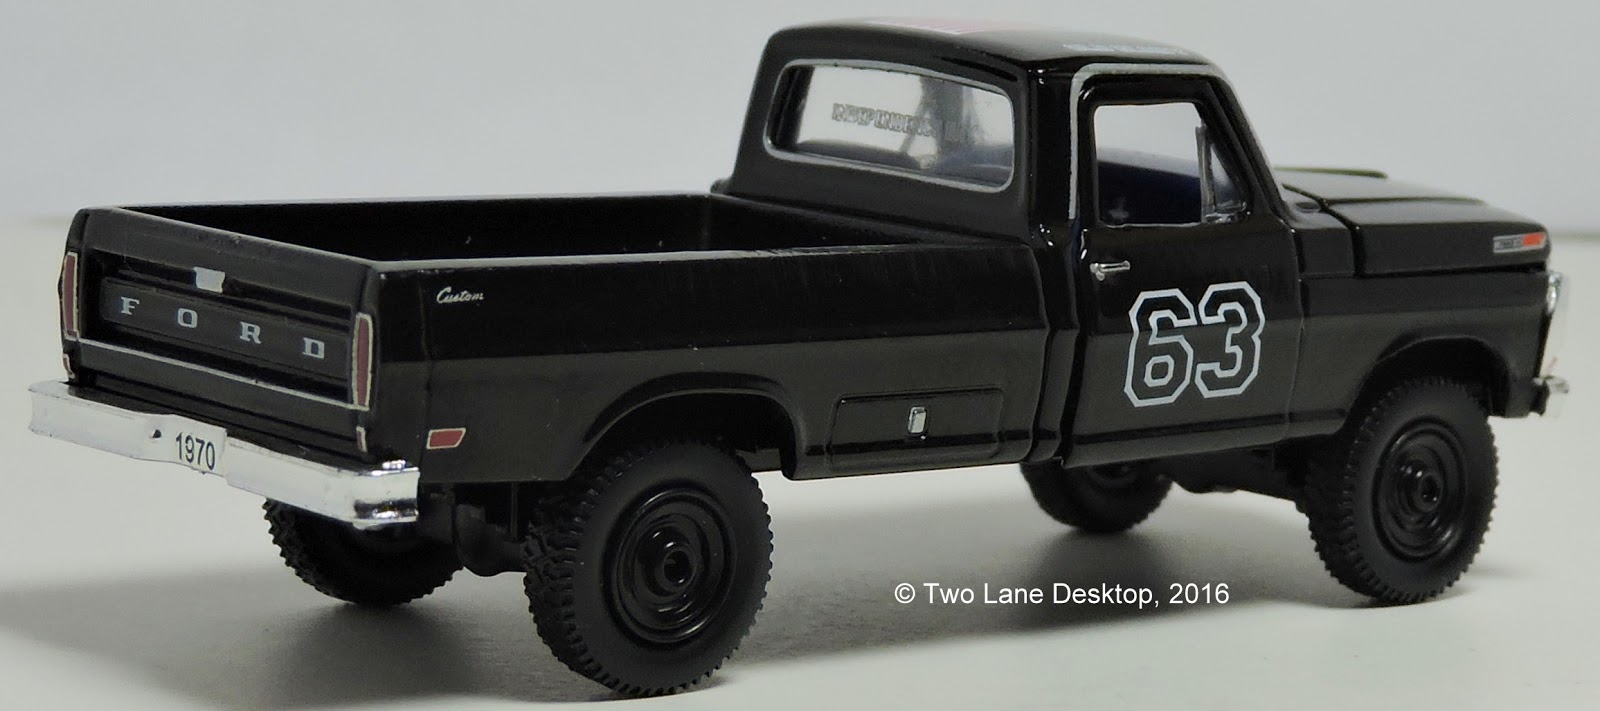 two lane desktop m2 machines 1970 ford f100 custom 4x4. Black Bedroom Furniture Sets. Home Design Ideas